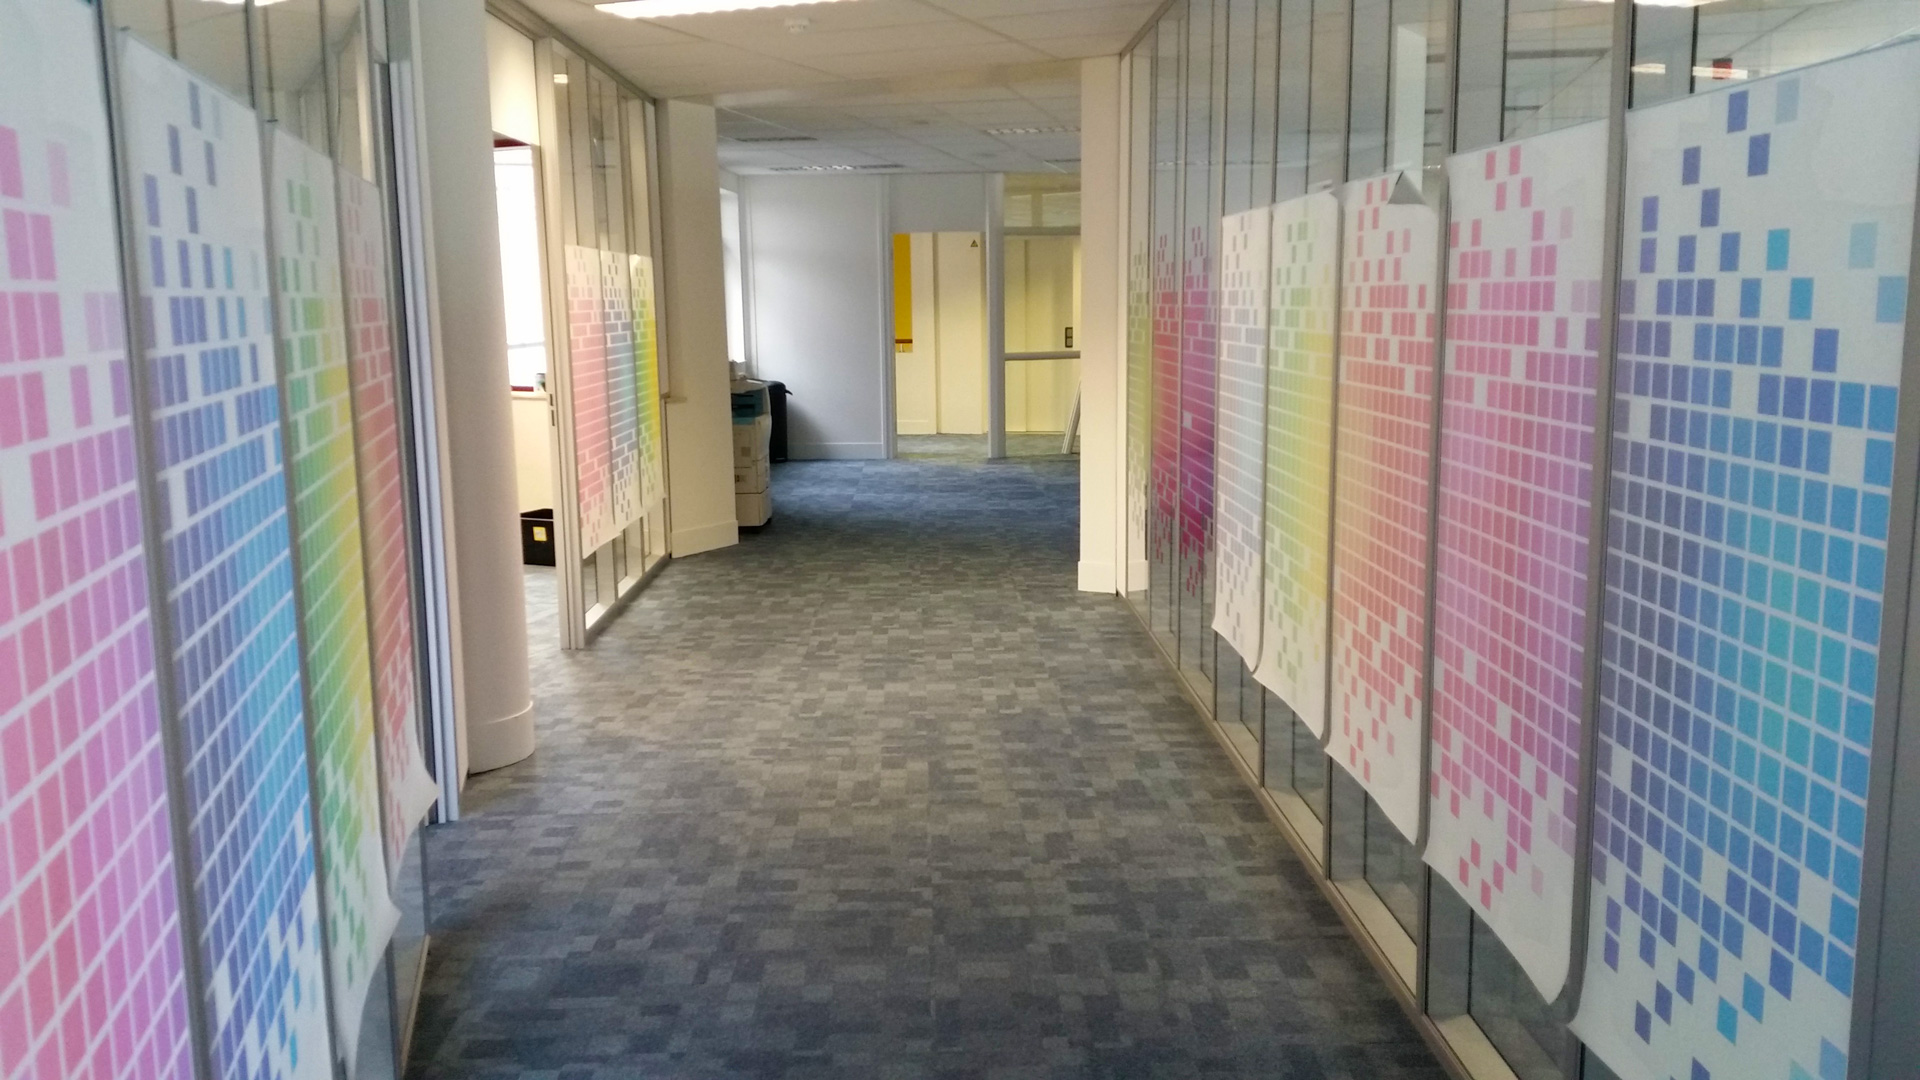 Raamfolie idee n te gebruiken voor eigen raamfolie ontwerp - Kantoor deco ...